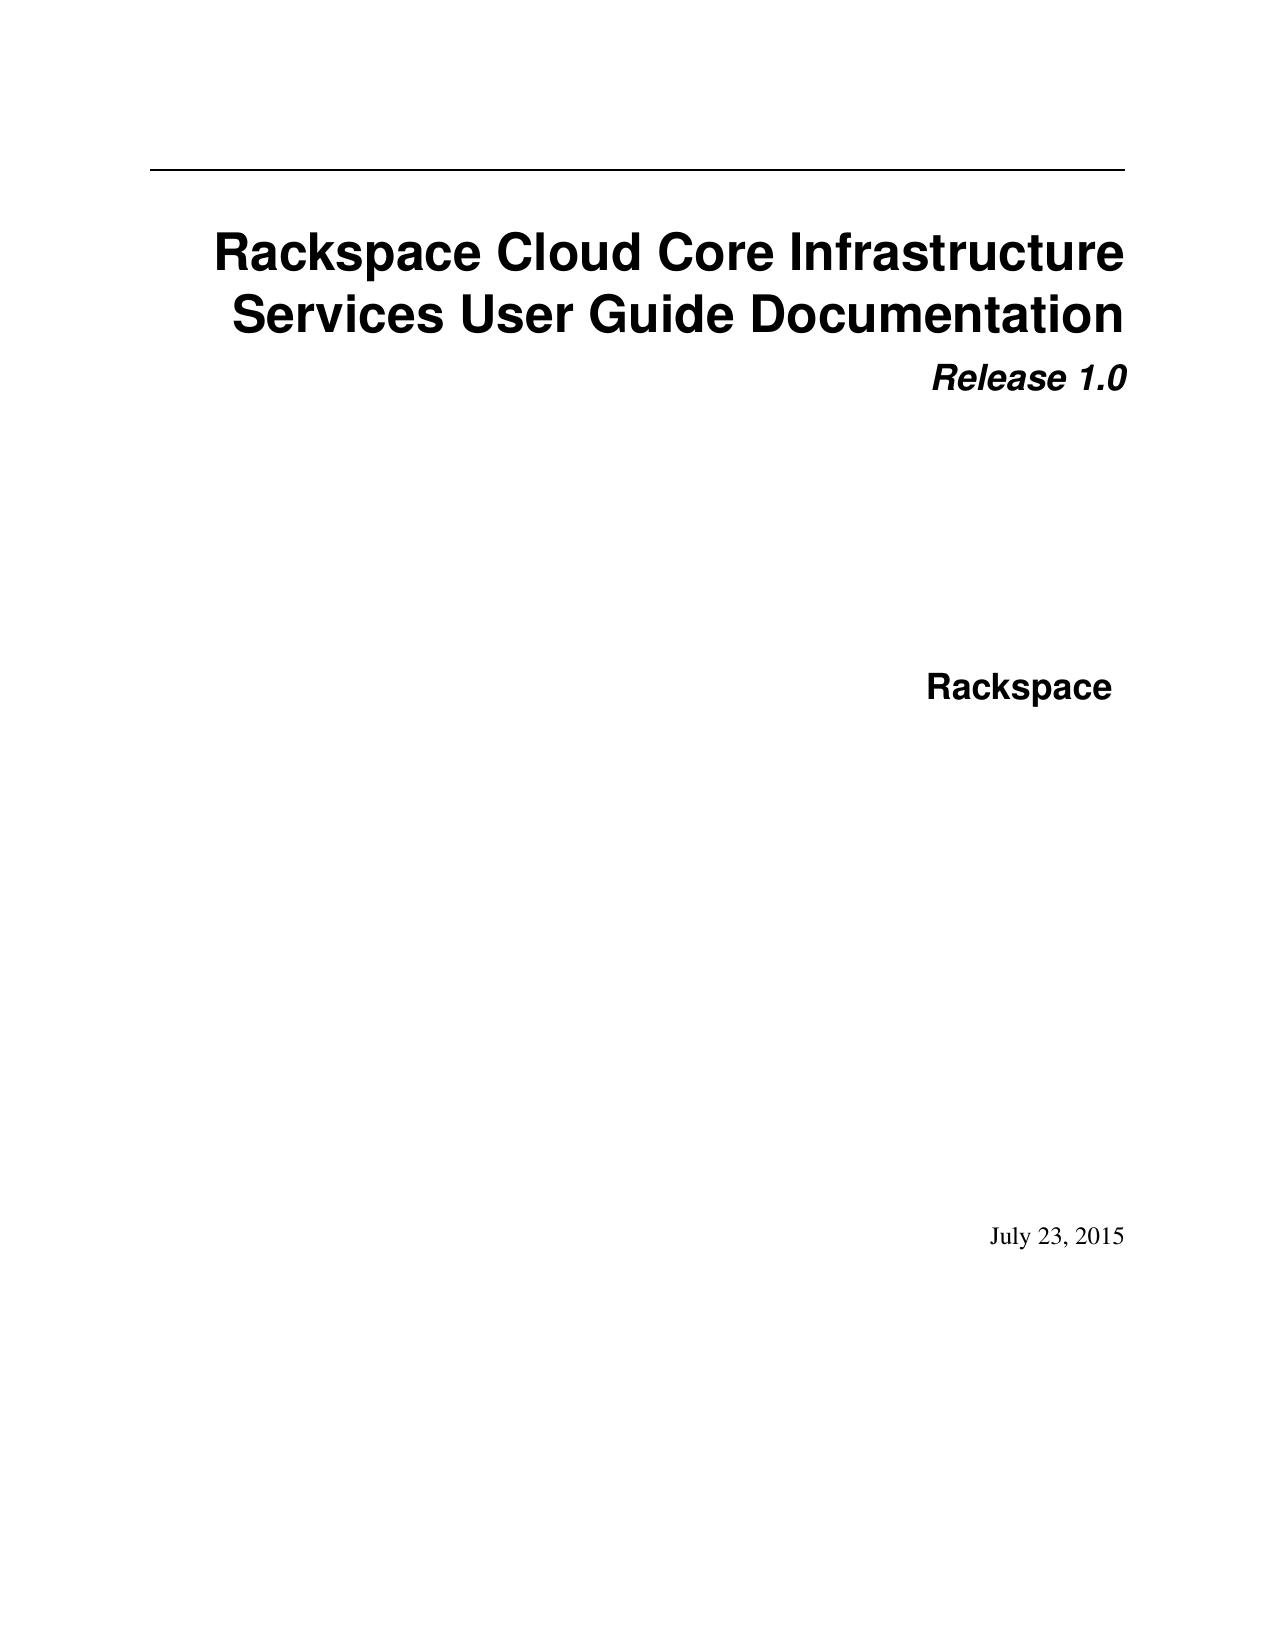 Rackspace Cloud Core Infrastructure Services User Guide